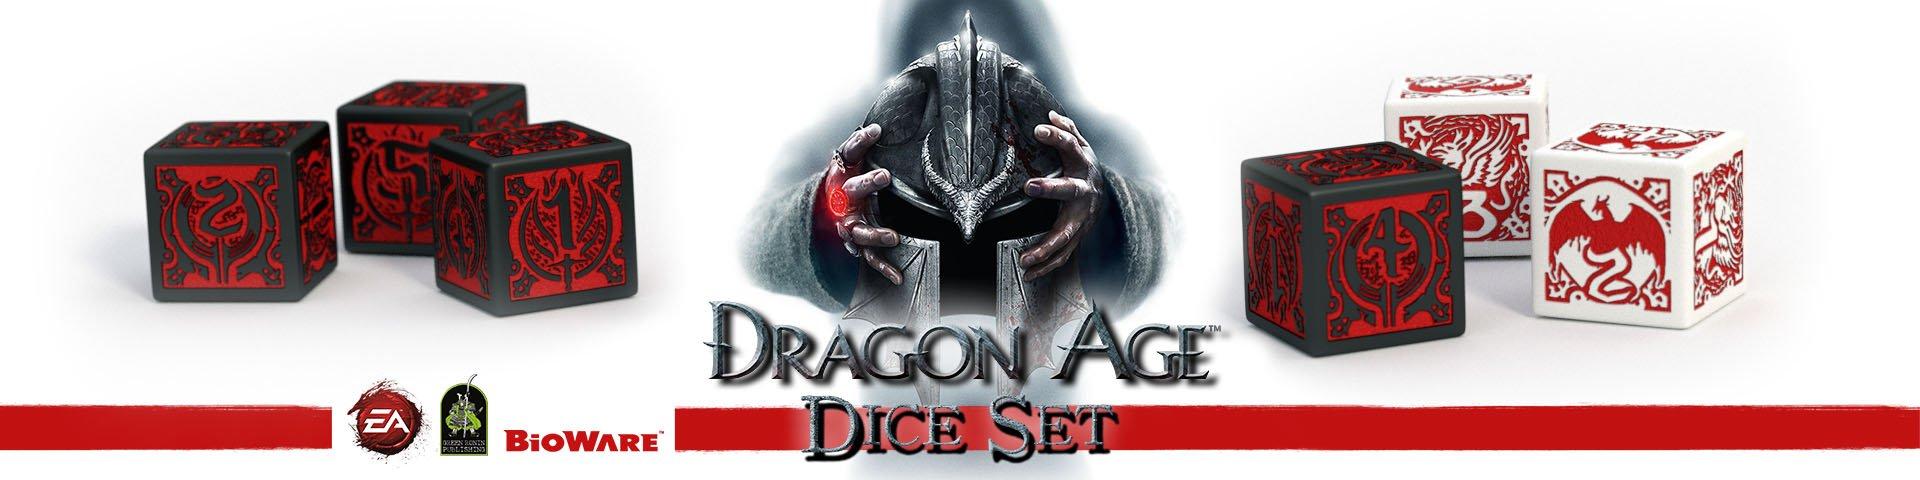 Dragon Age Dice